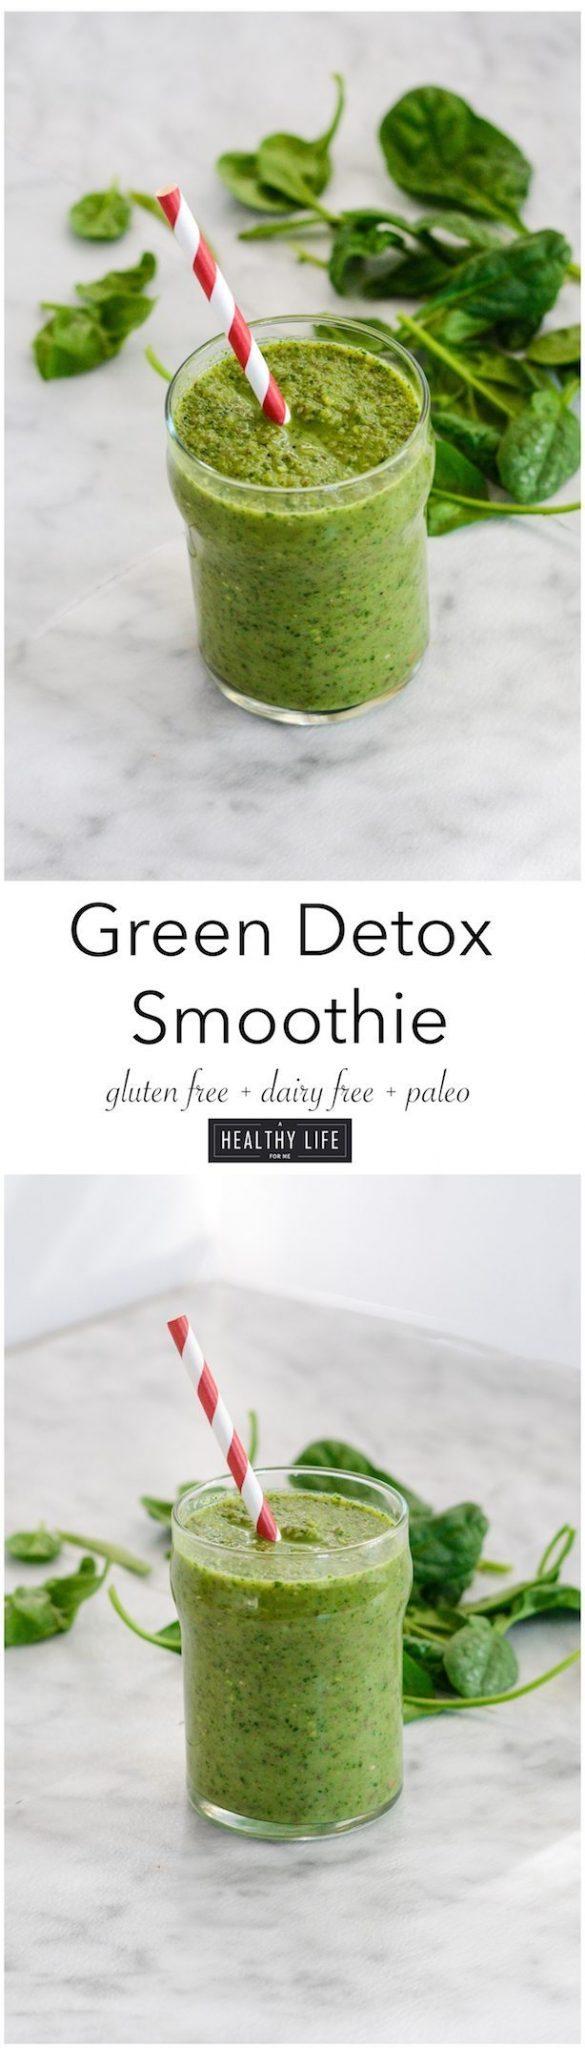 Green Detox Smoothie Recipe Gluten Free Dairy Free Paleo Friendly | ahealthylifeforme.com